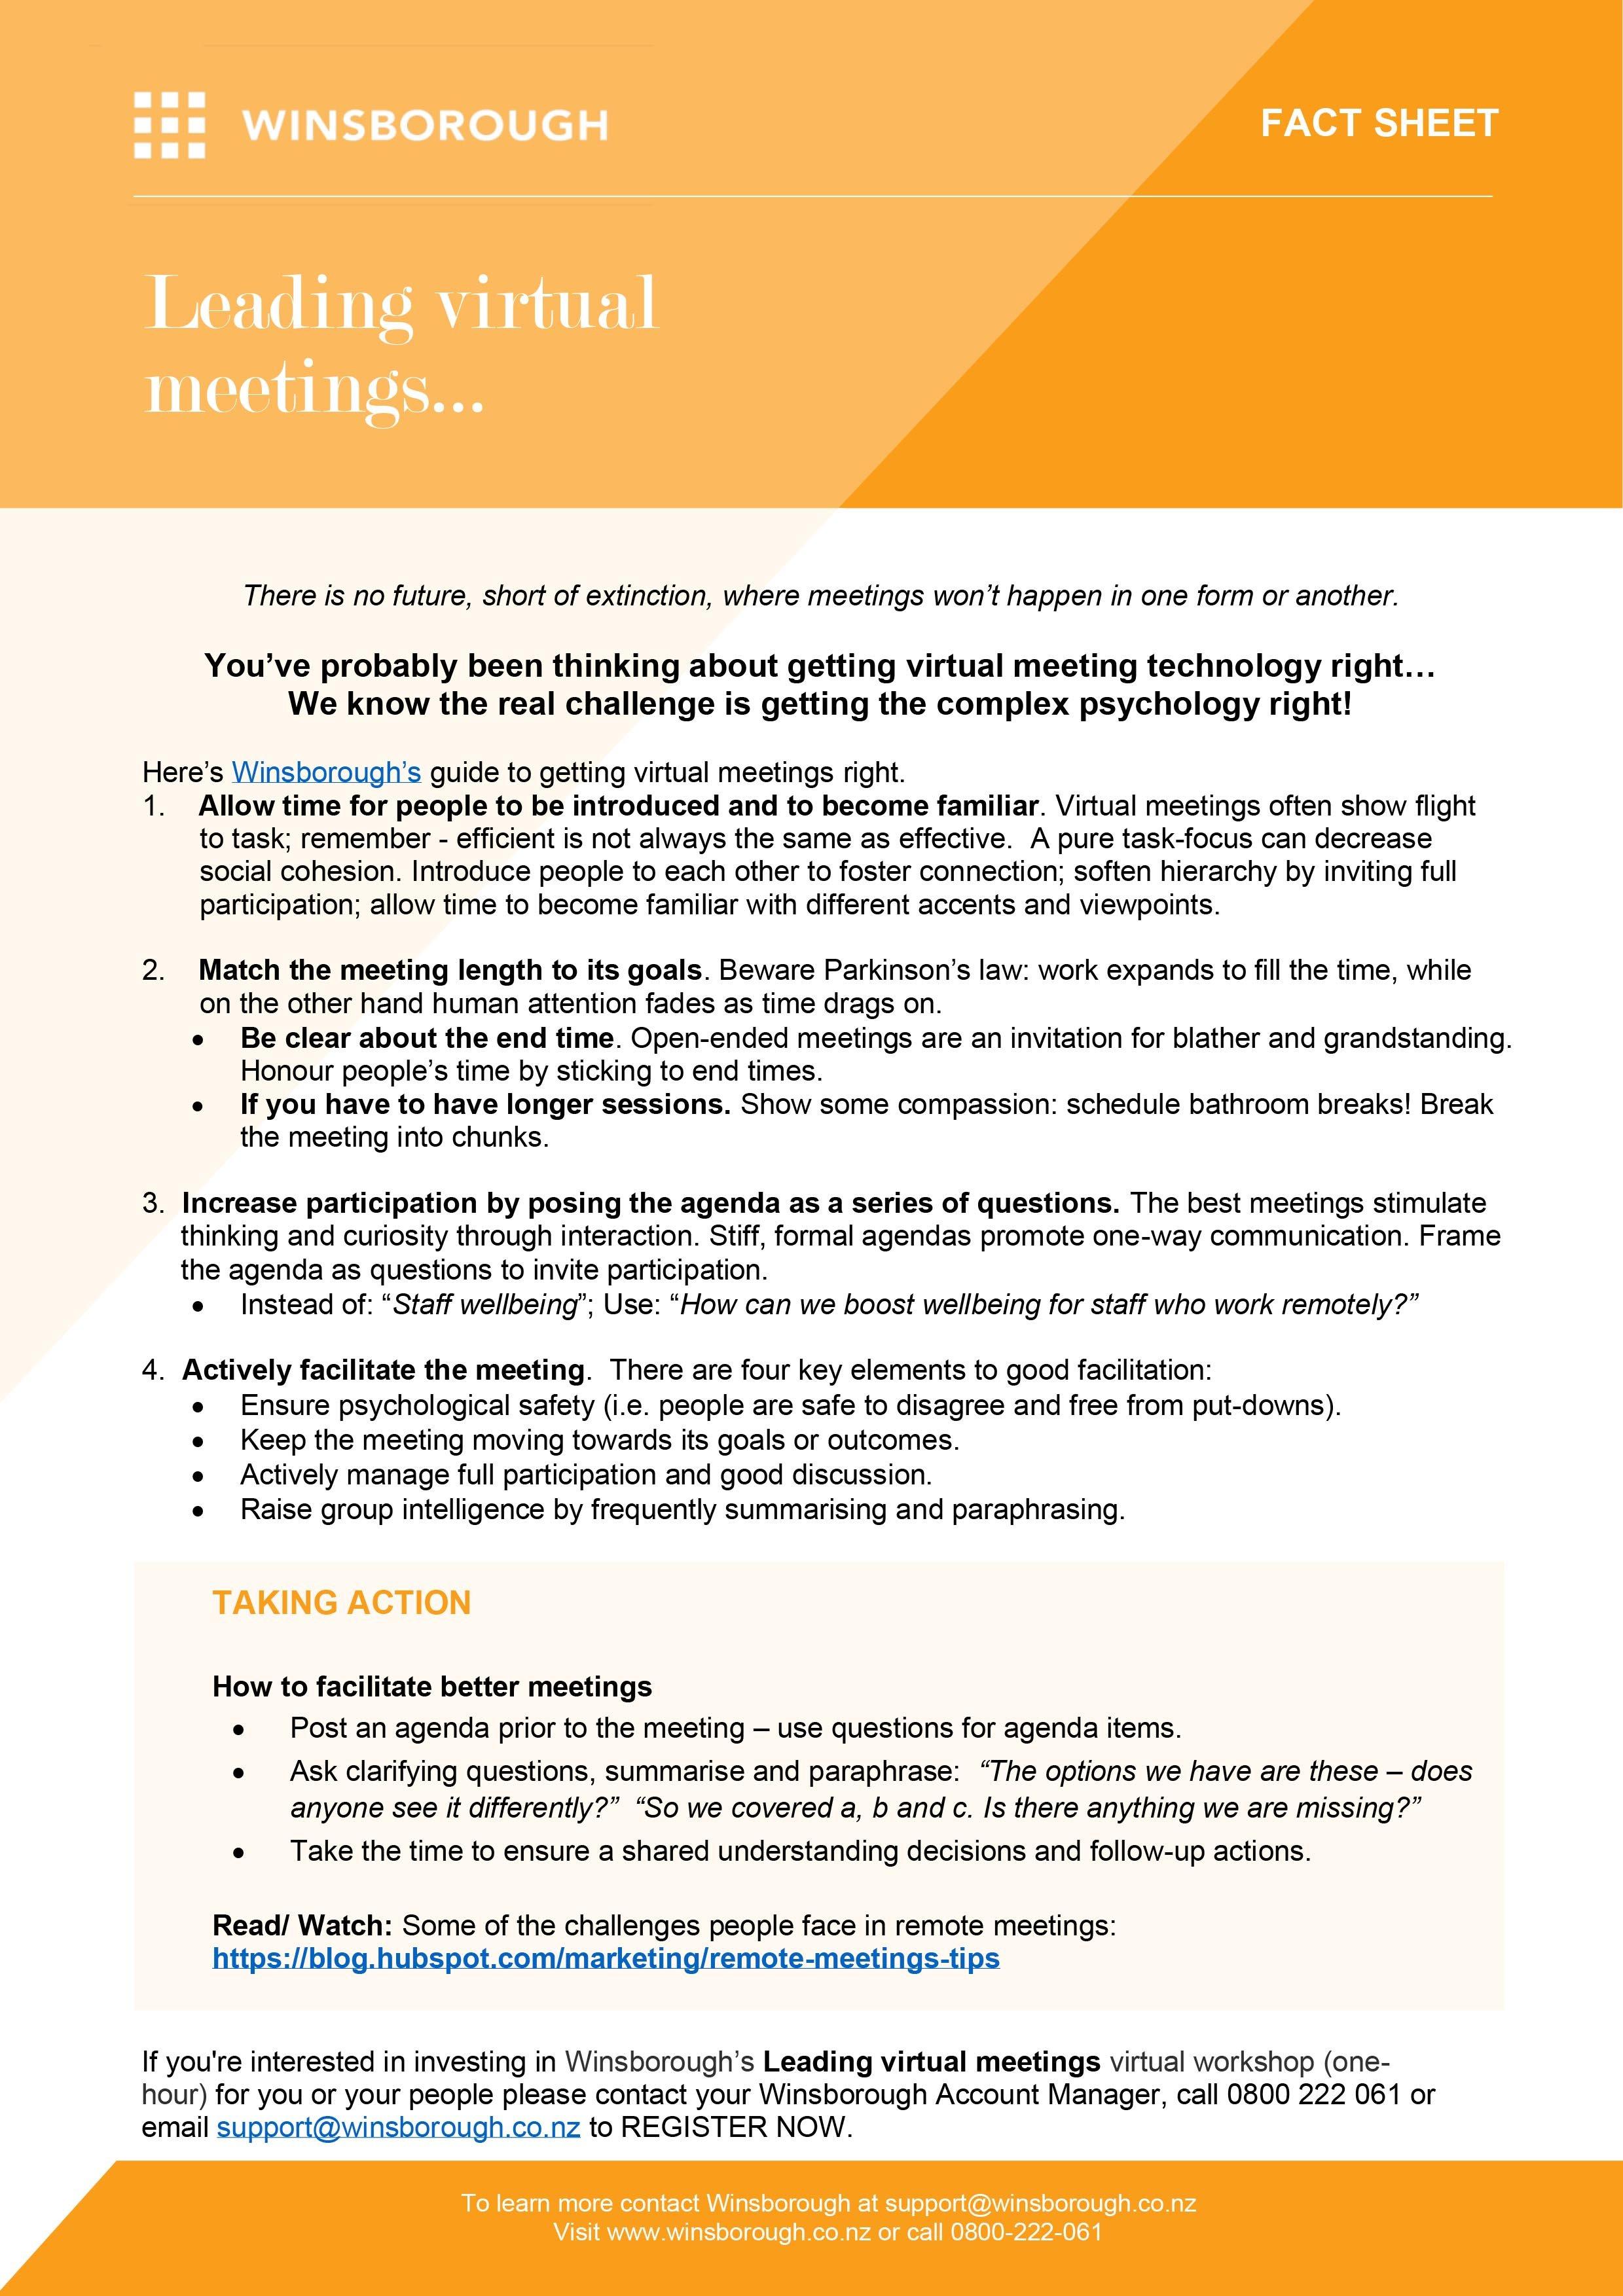 99_Winsborough_Leading_virtual_meetings_FactSheet_2020_04_29